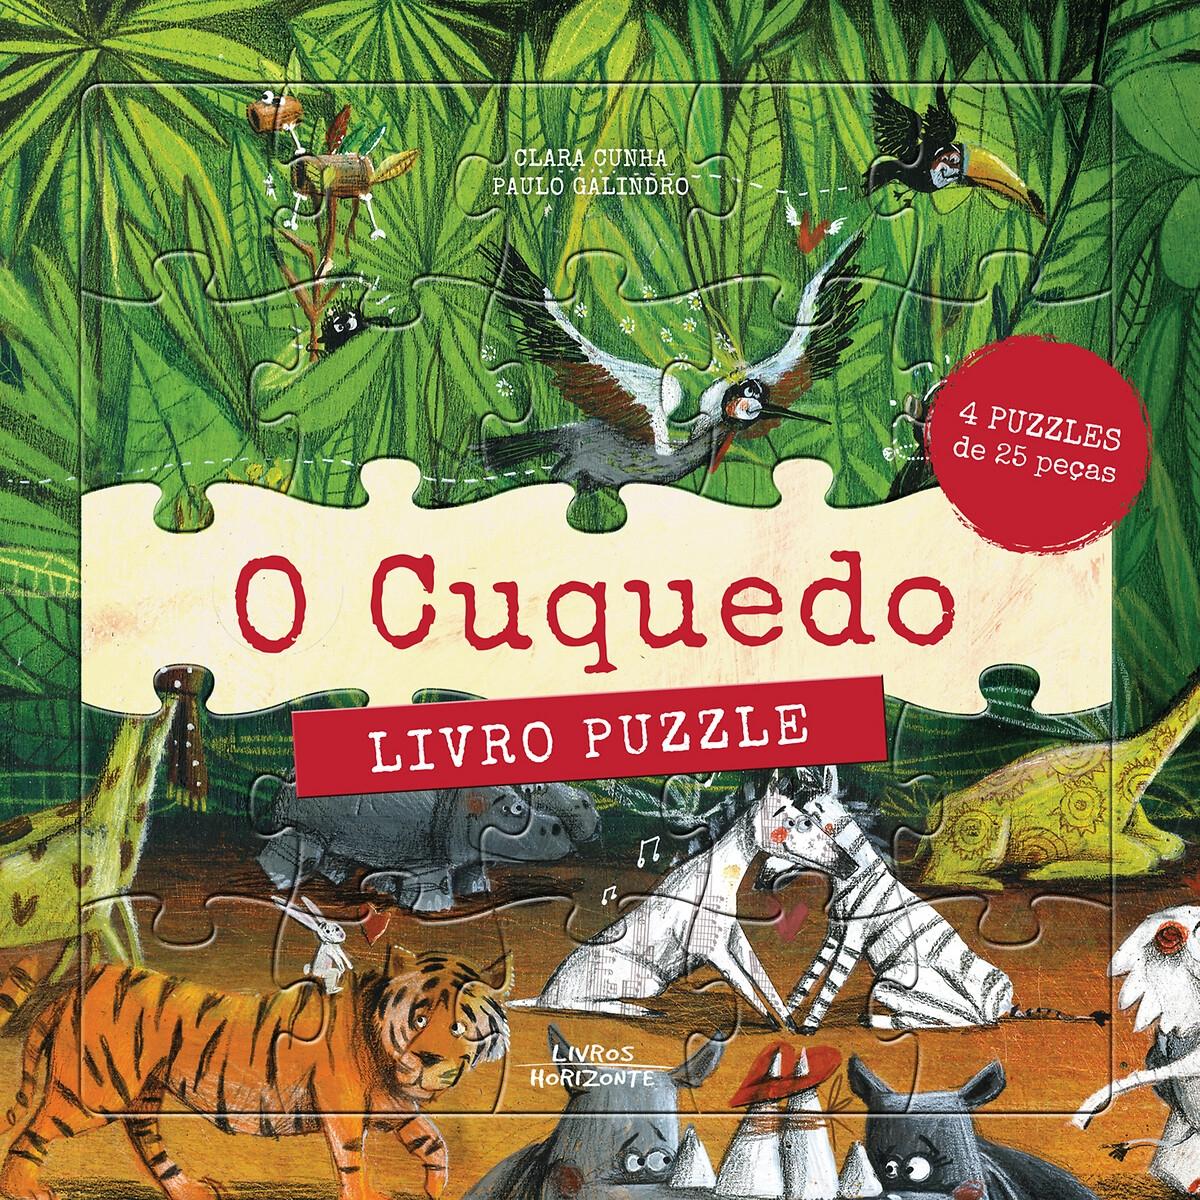 LIVROS HORIZONTE - Livros Horizonte Livro O Cuquedo - Livro Puzzle